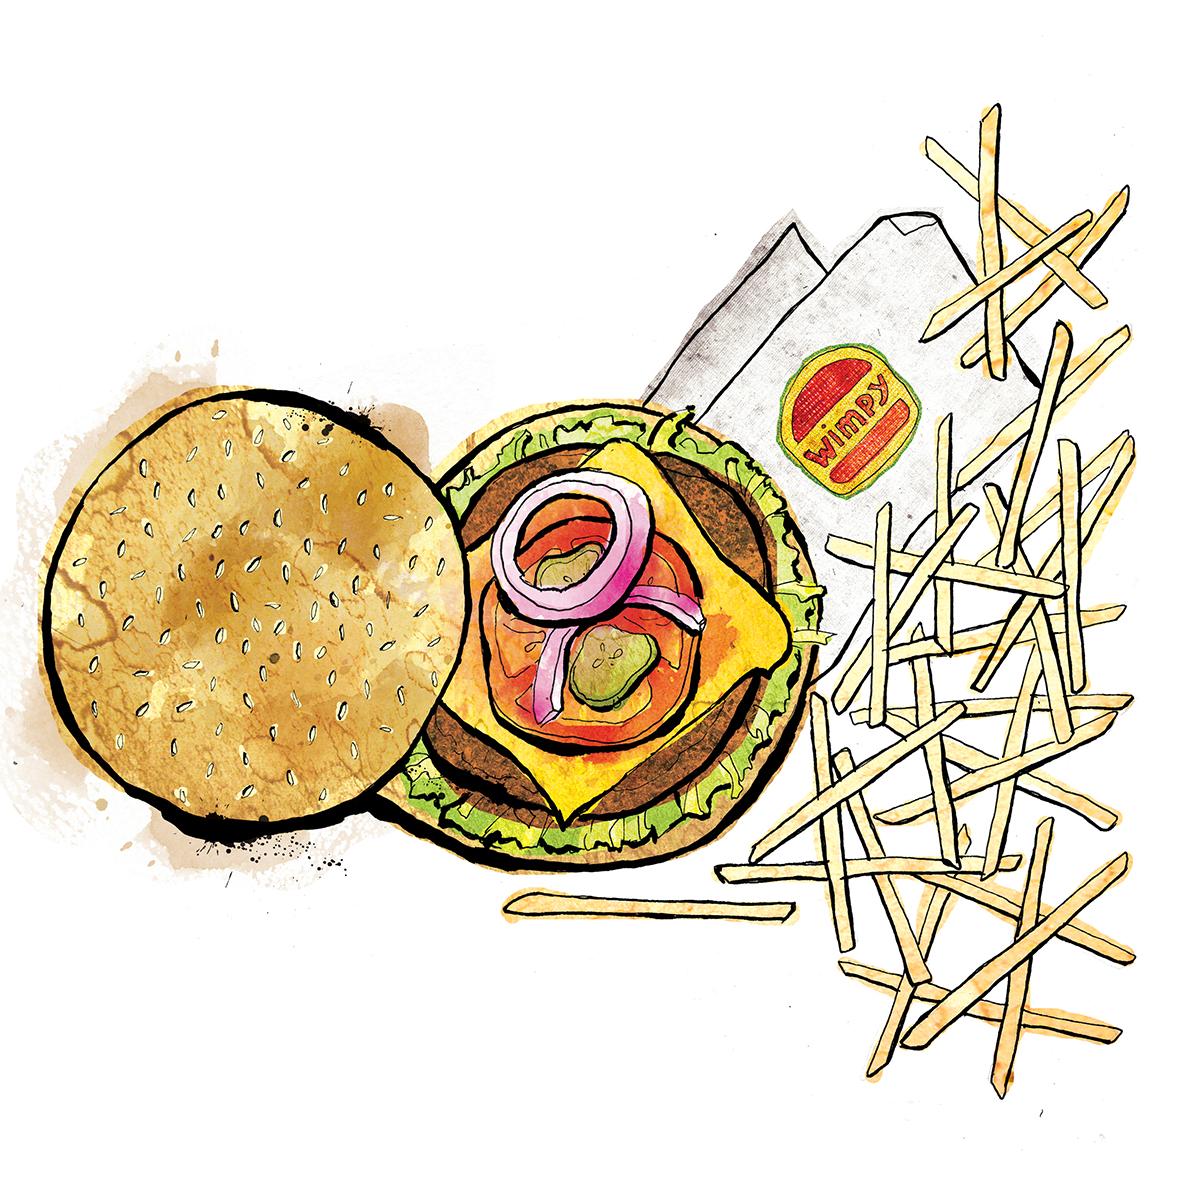 burger and chips illustration